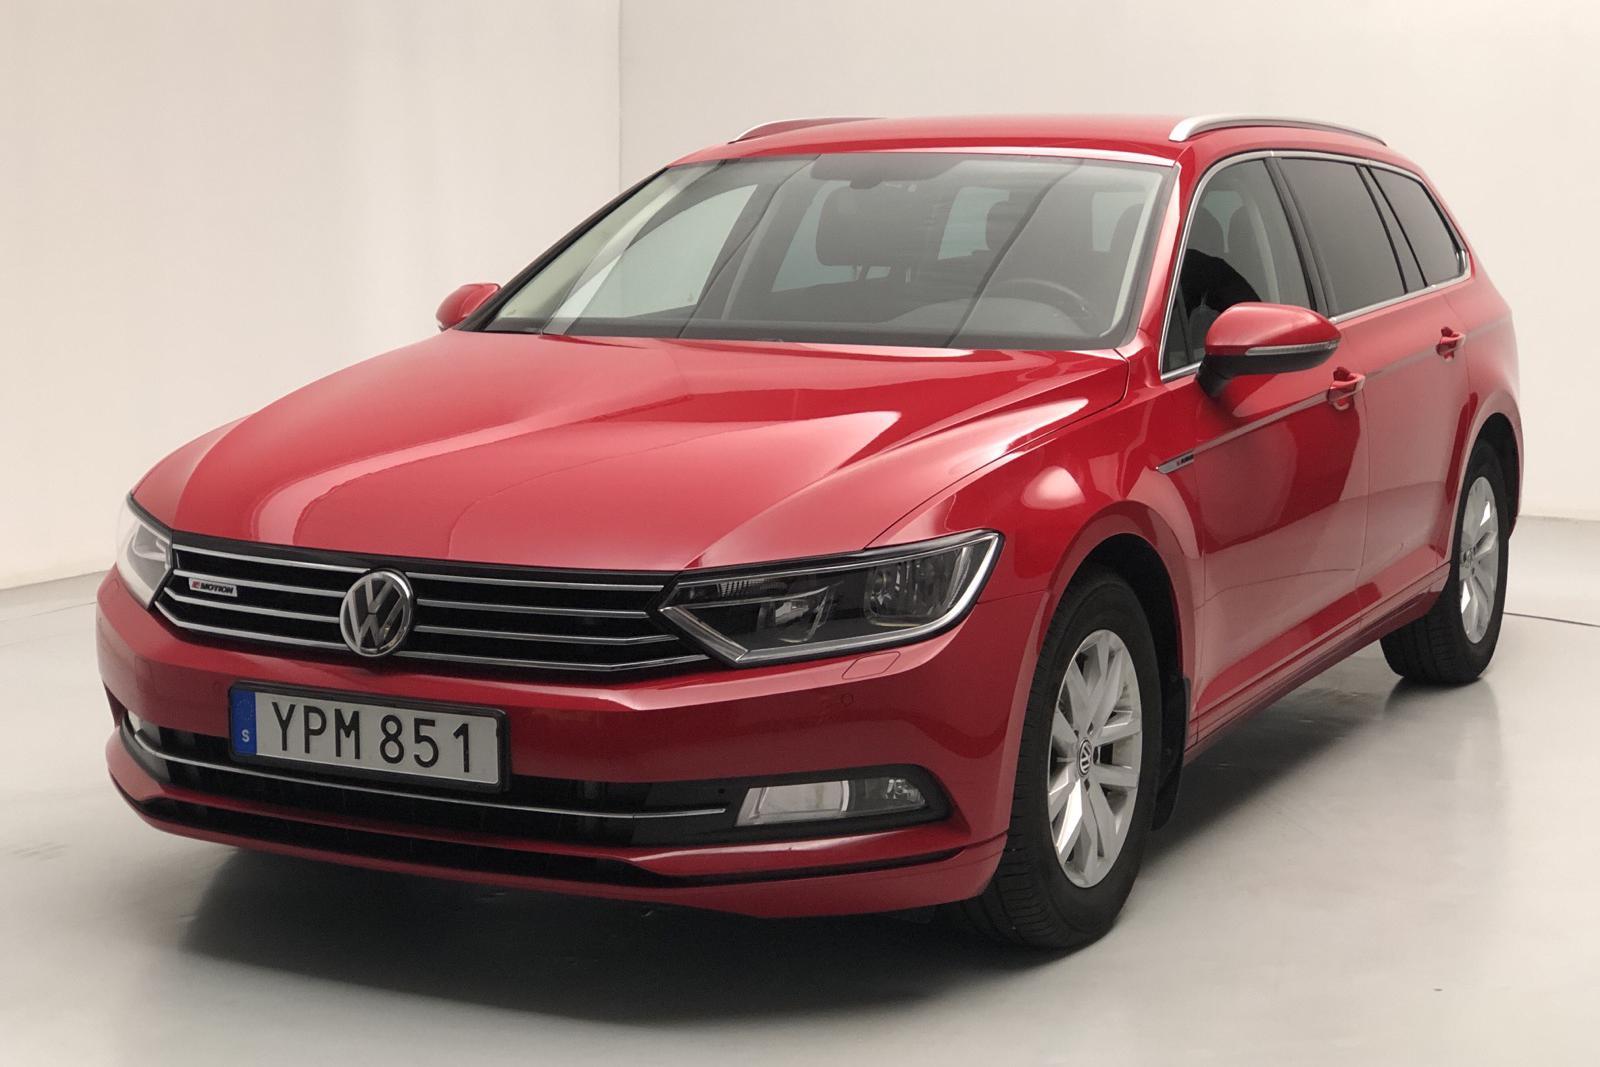 VW Passat 2.0 TDI Sportscombi 4MOTION (150hk) - 264 486 km - Manual - red - 2018